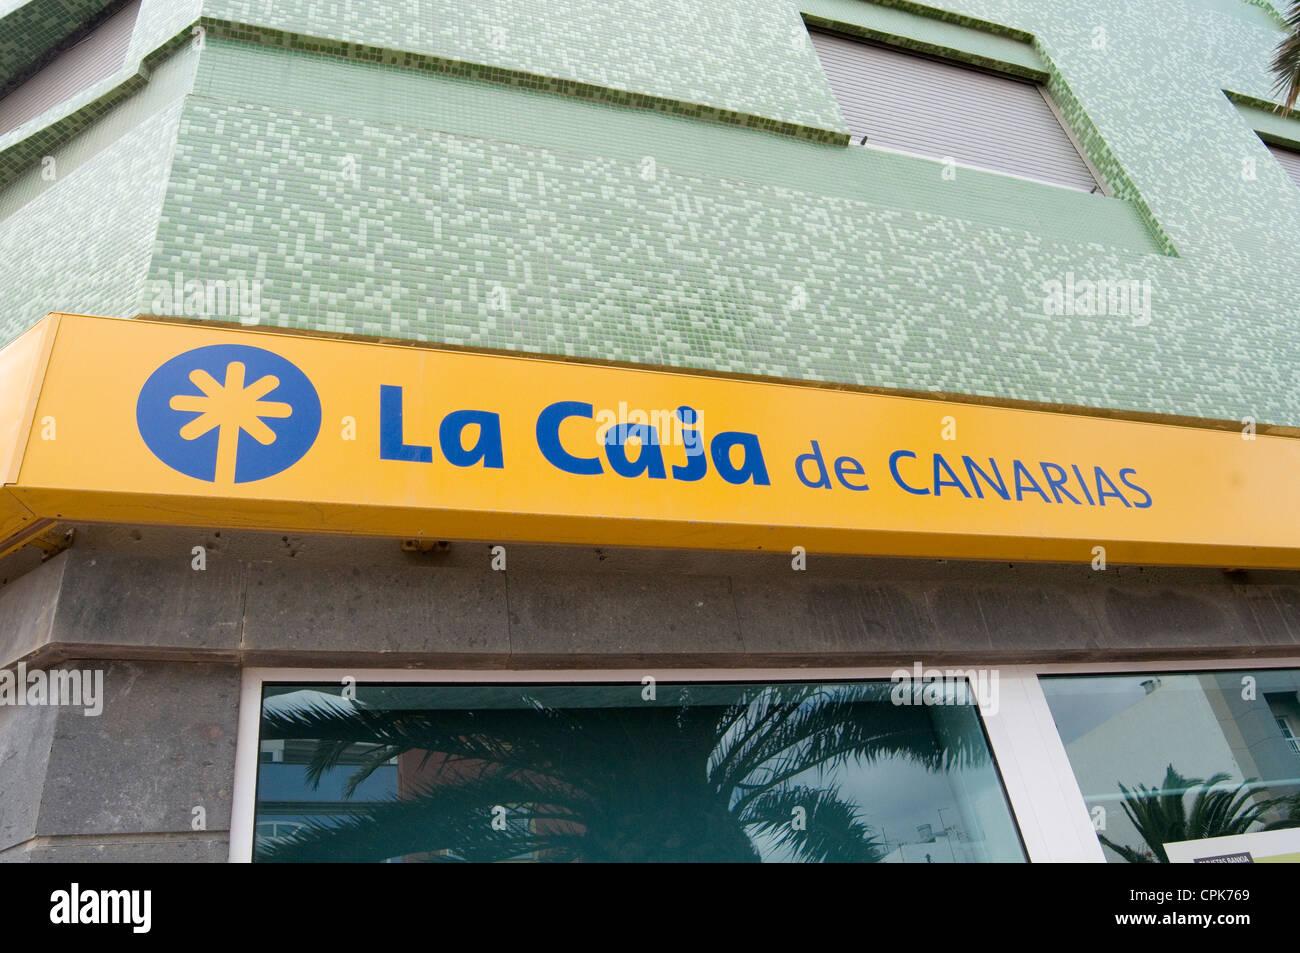 La Caja de Canarias Tochtergesellschaft des spanischen Bankia bank Banken Banken Stockbild